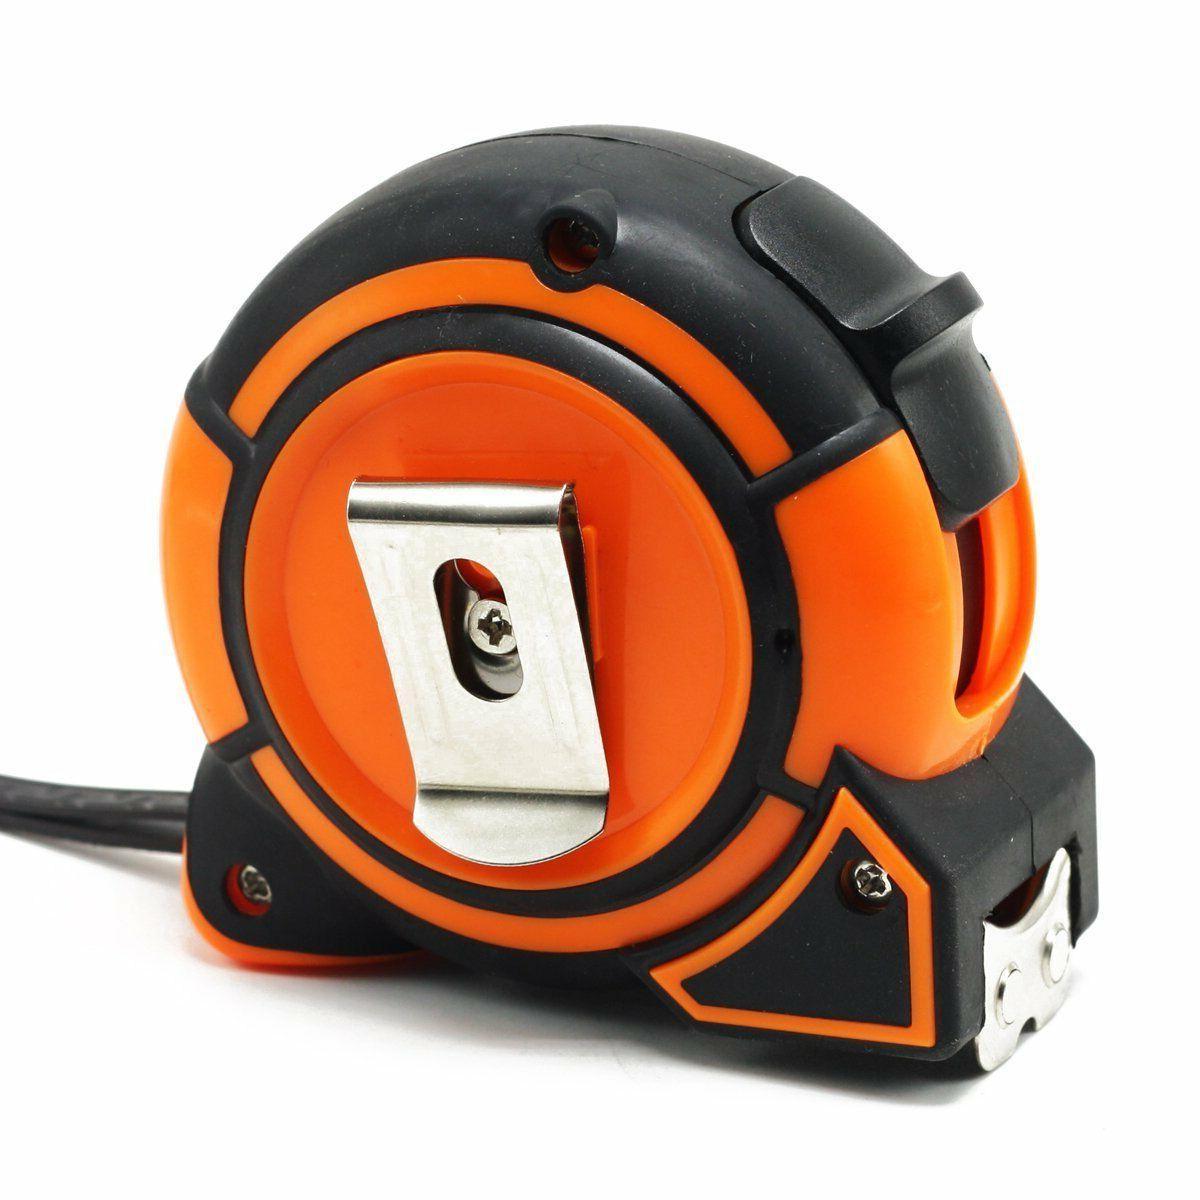 NEW Orange Tape Measure 1-Inch x 25-Foot Retractable Heavy Duty